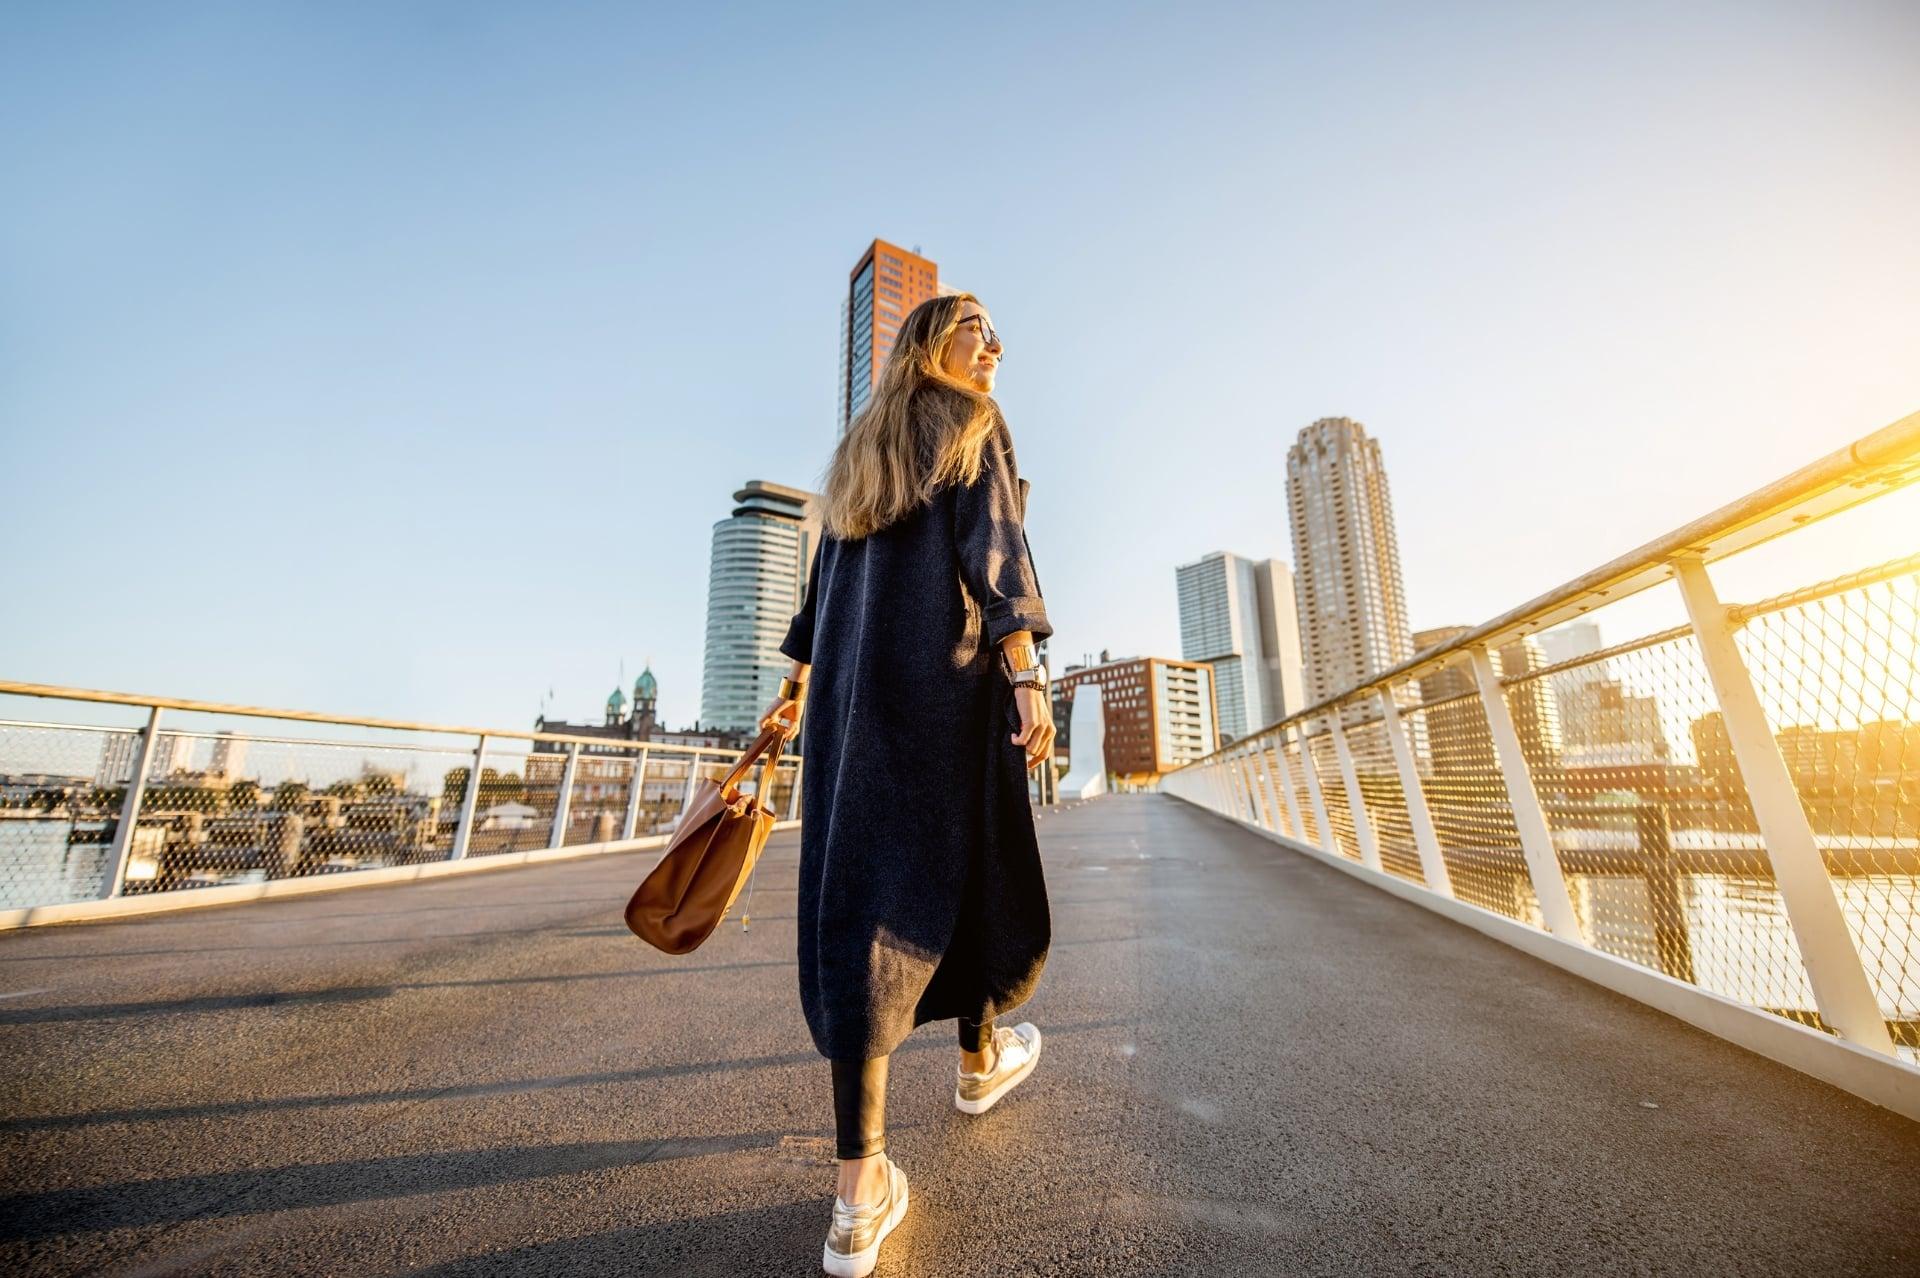 Explore the city of Rotterdam